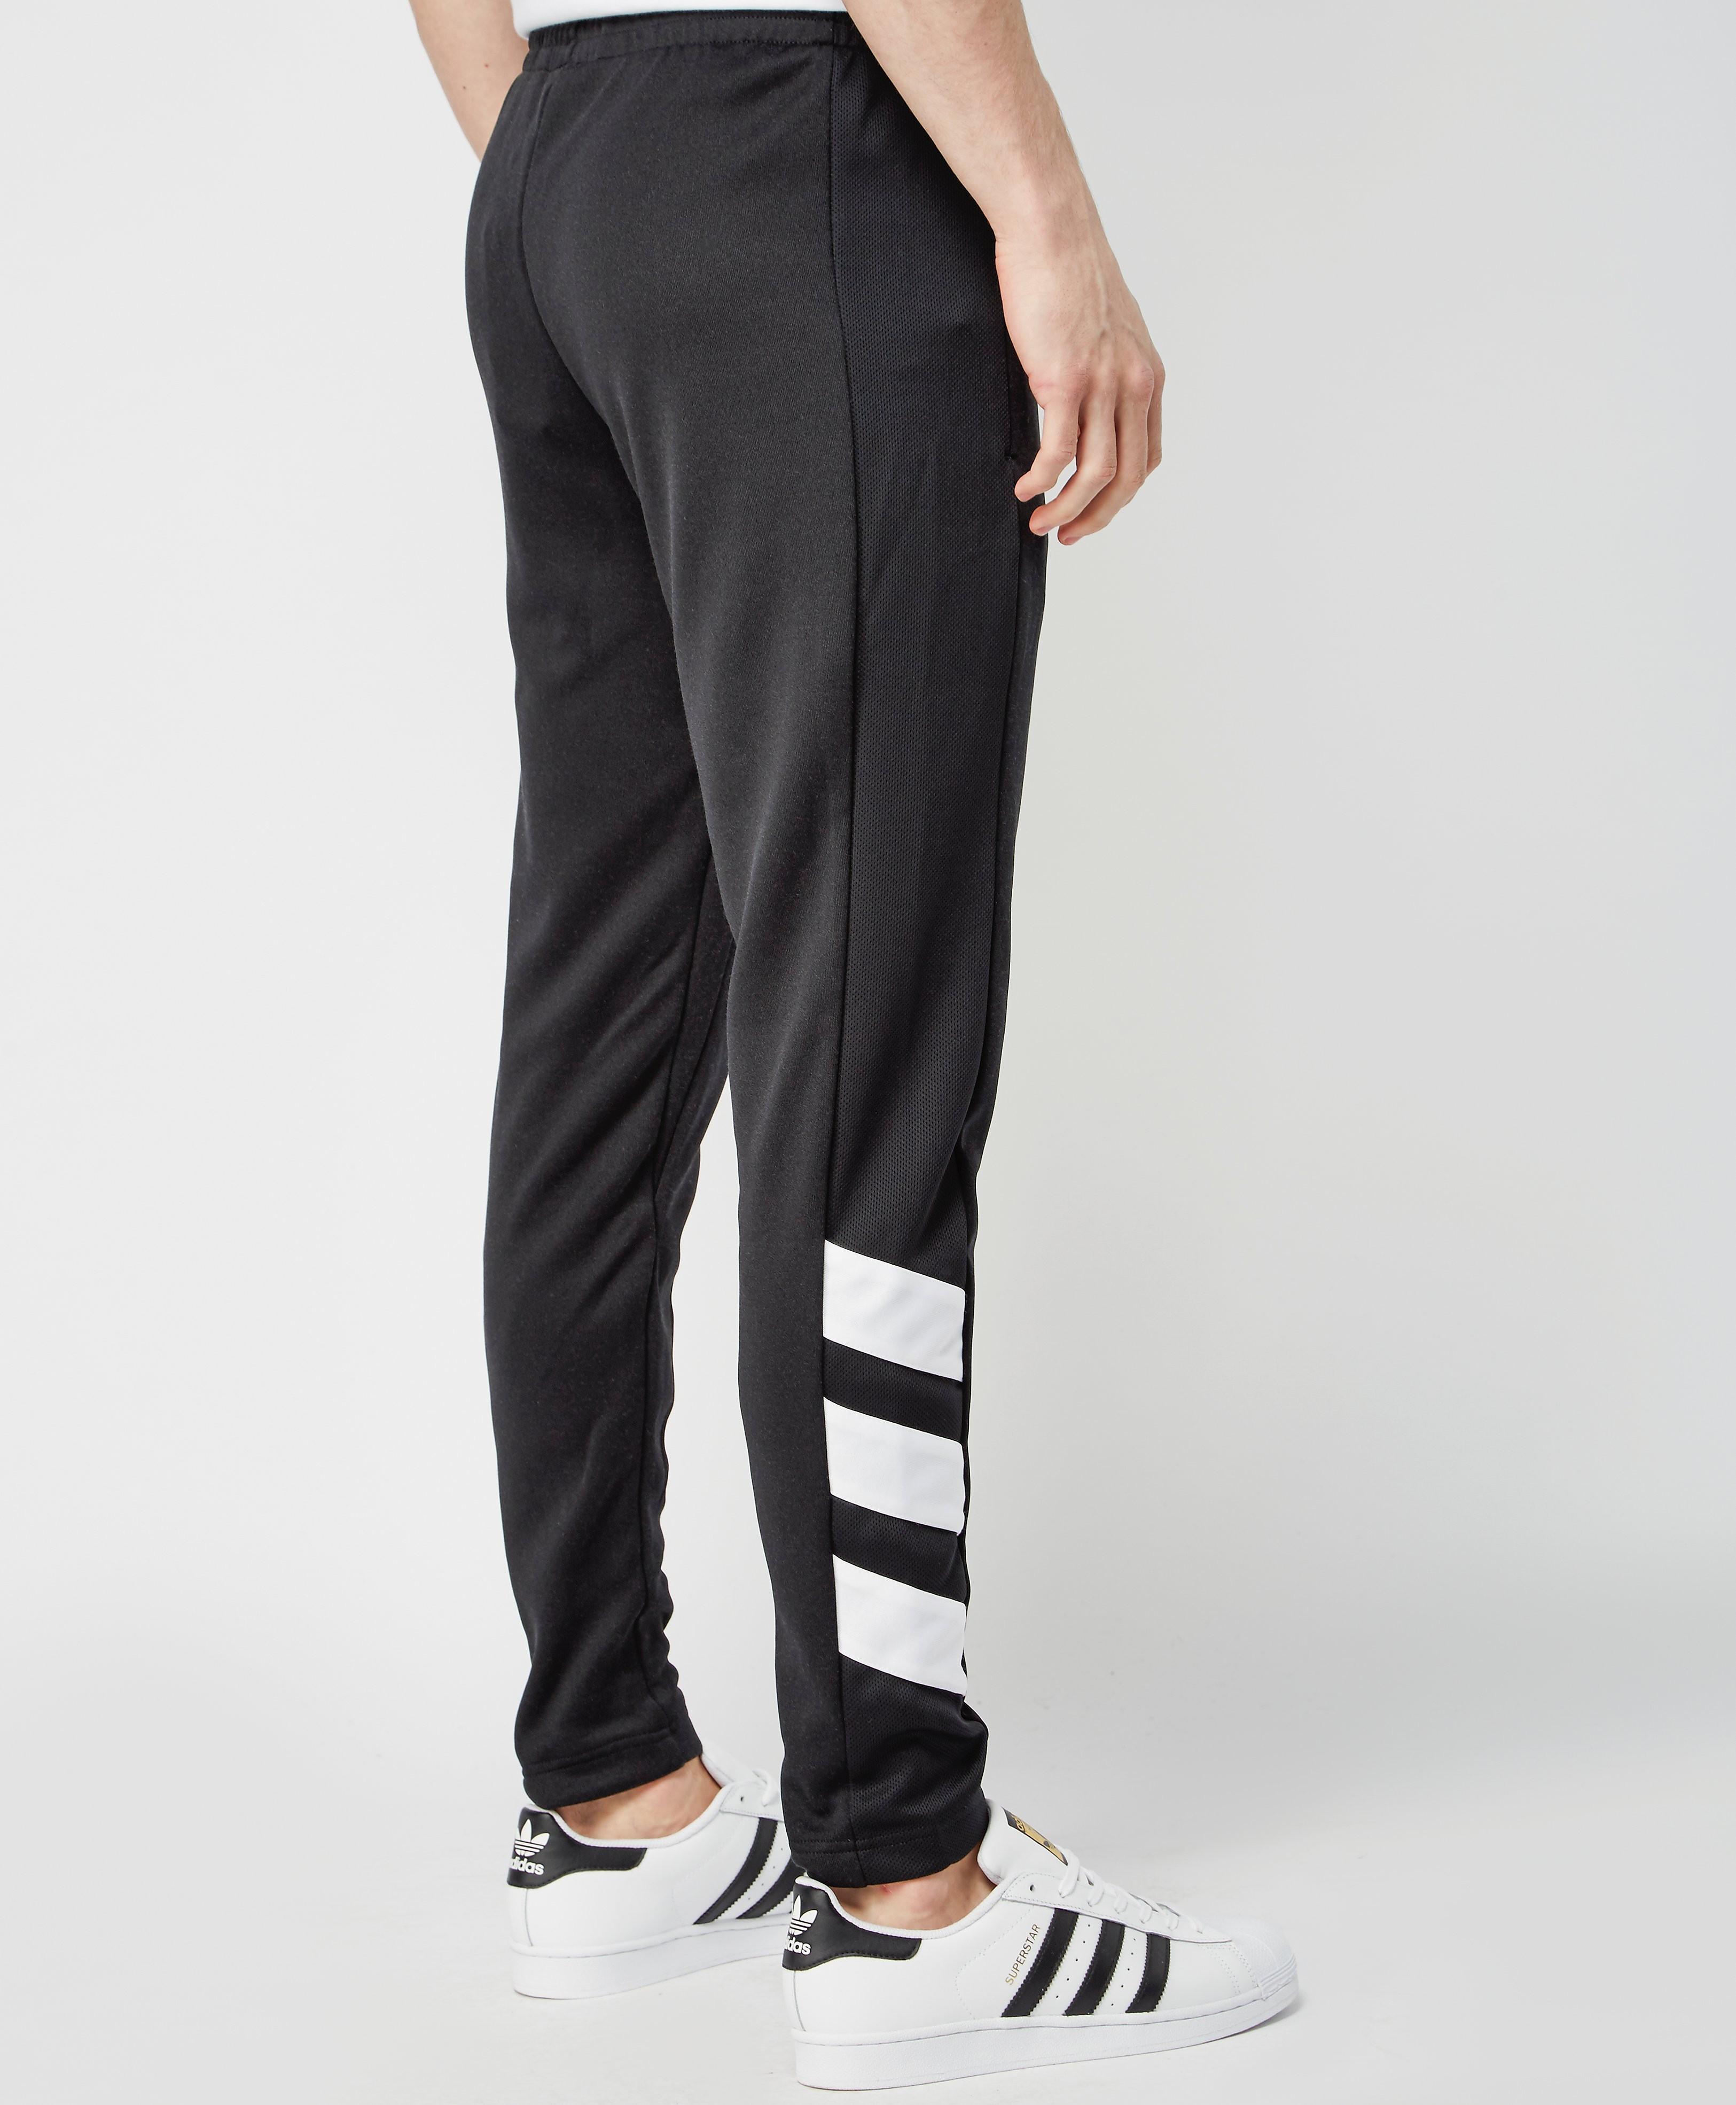 adidas Originals Trefoil Football Club Poly Pants